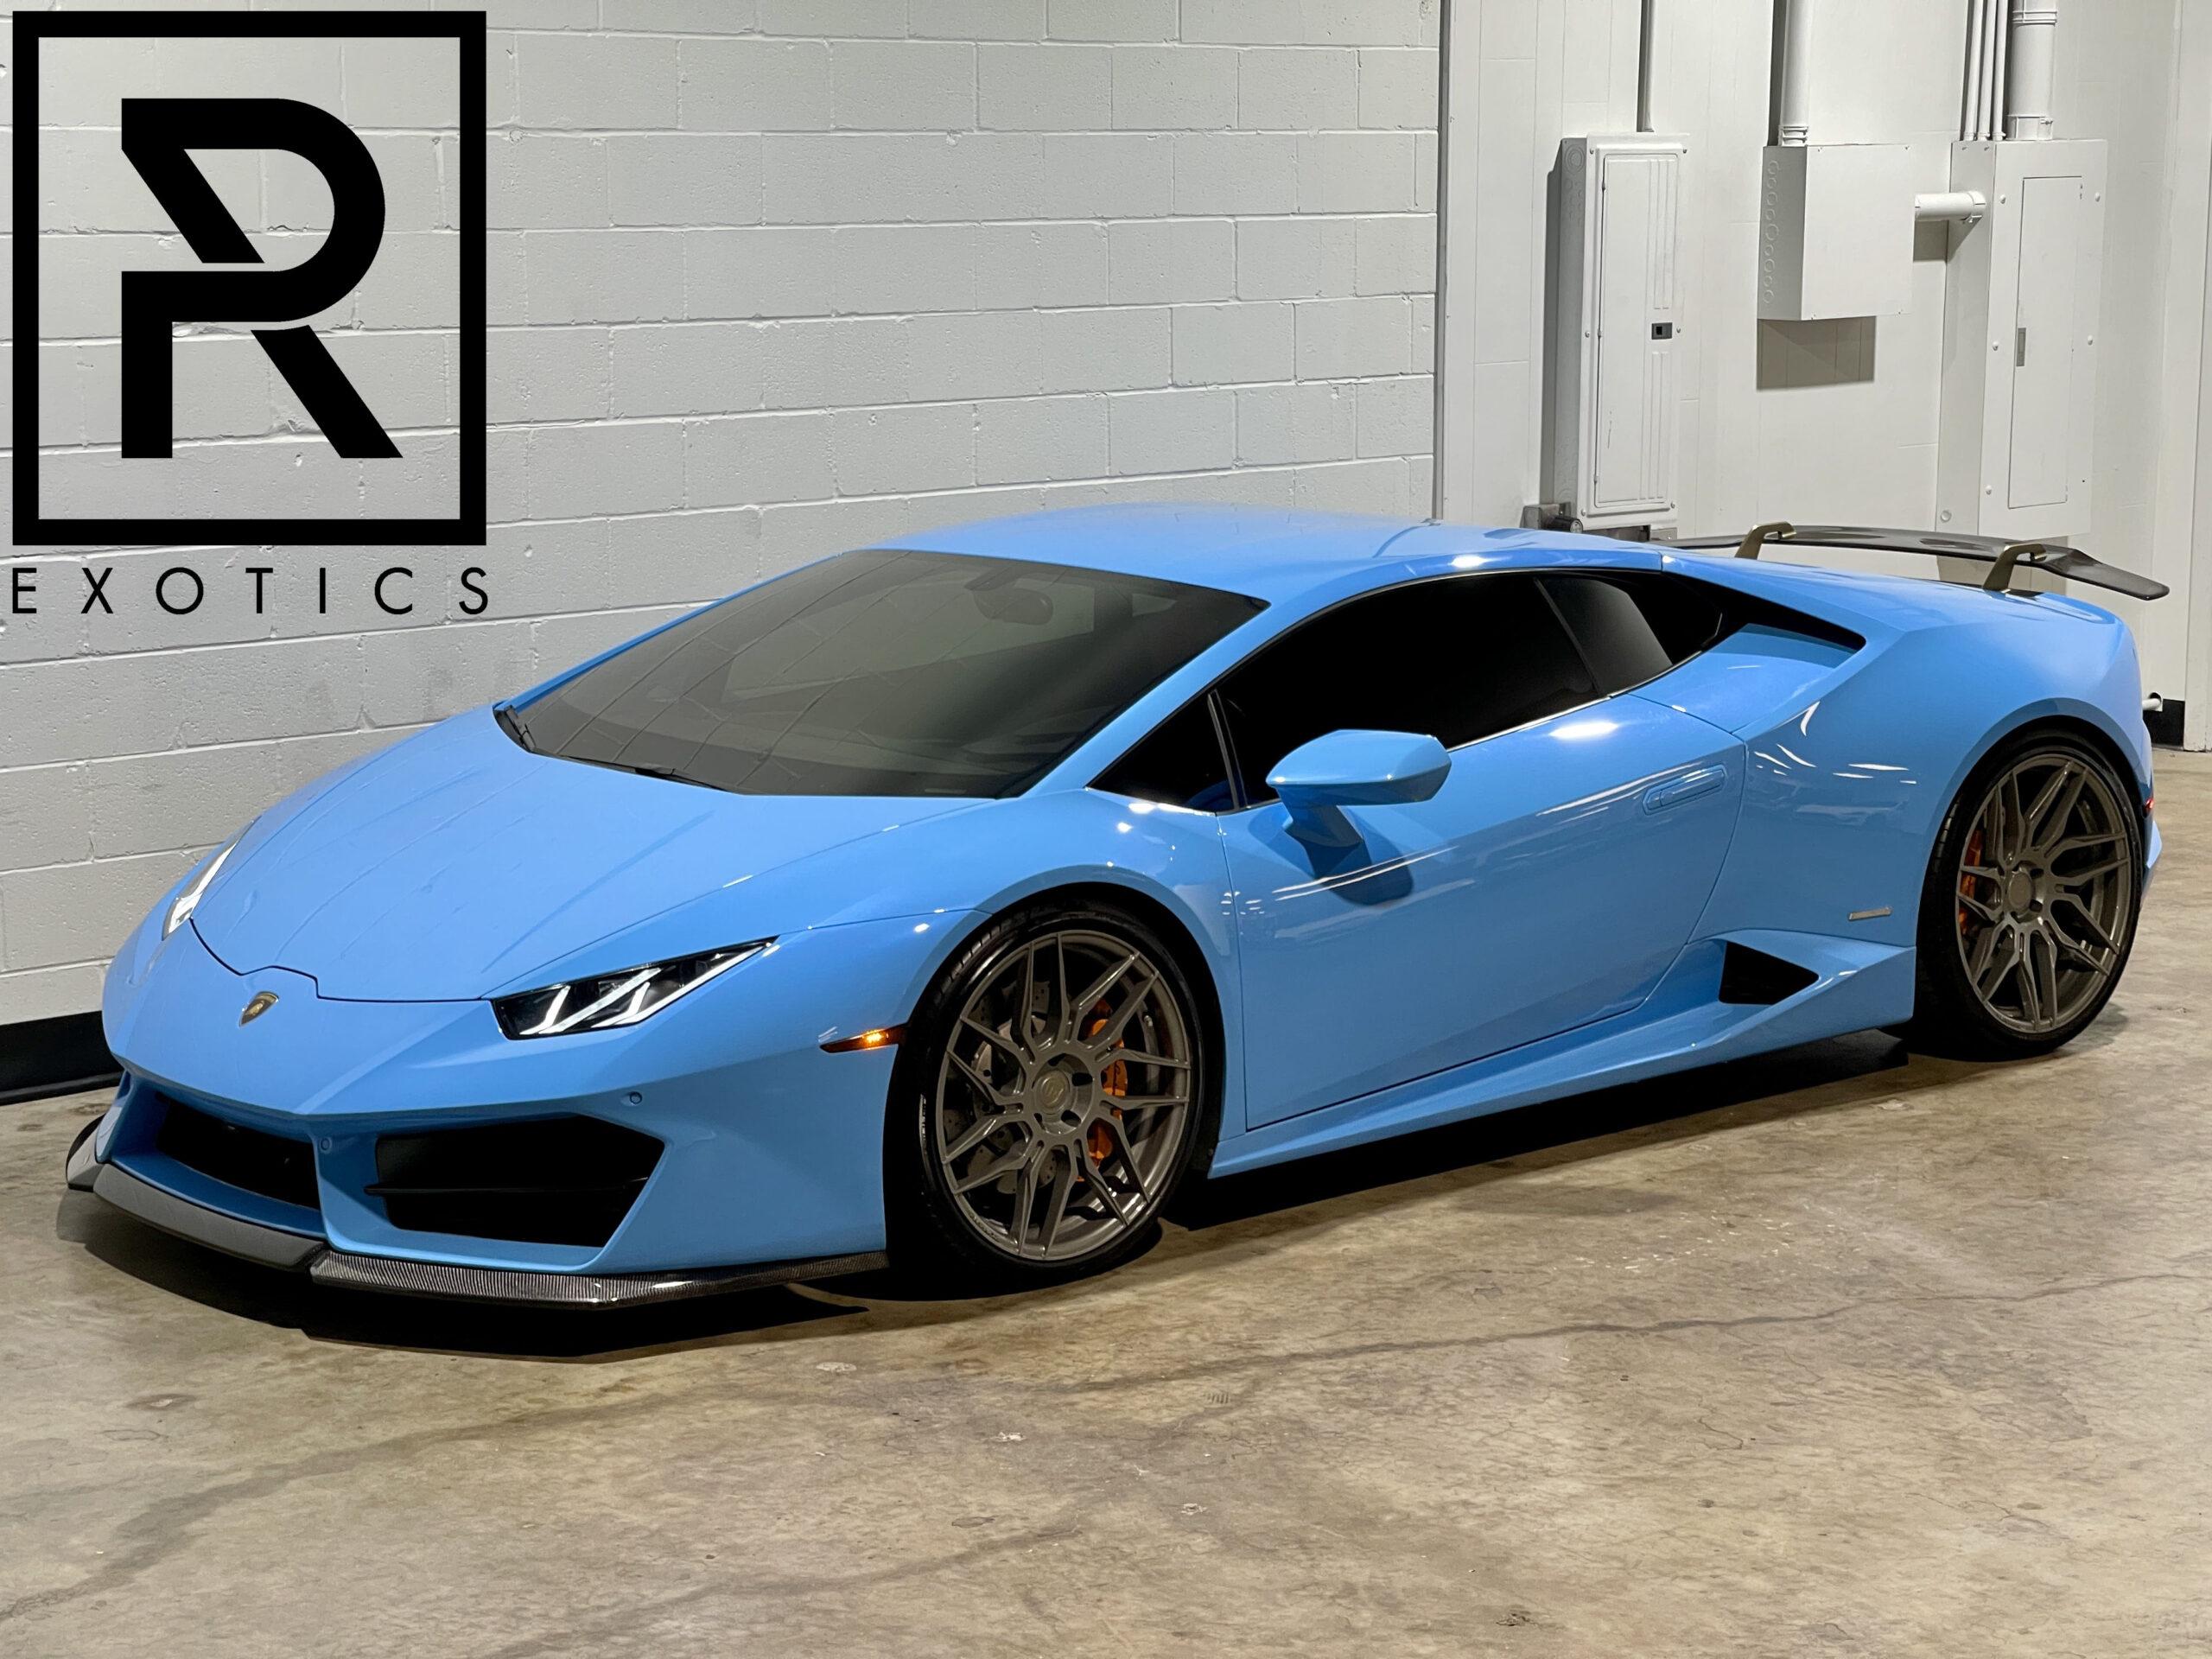 2017 Lamborghini Huracan Twin Turbo Thumbnail